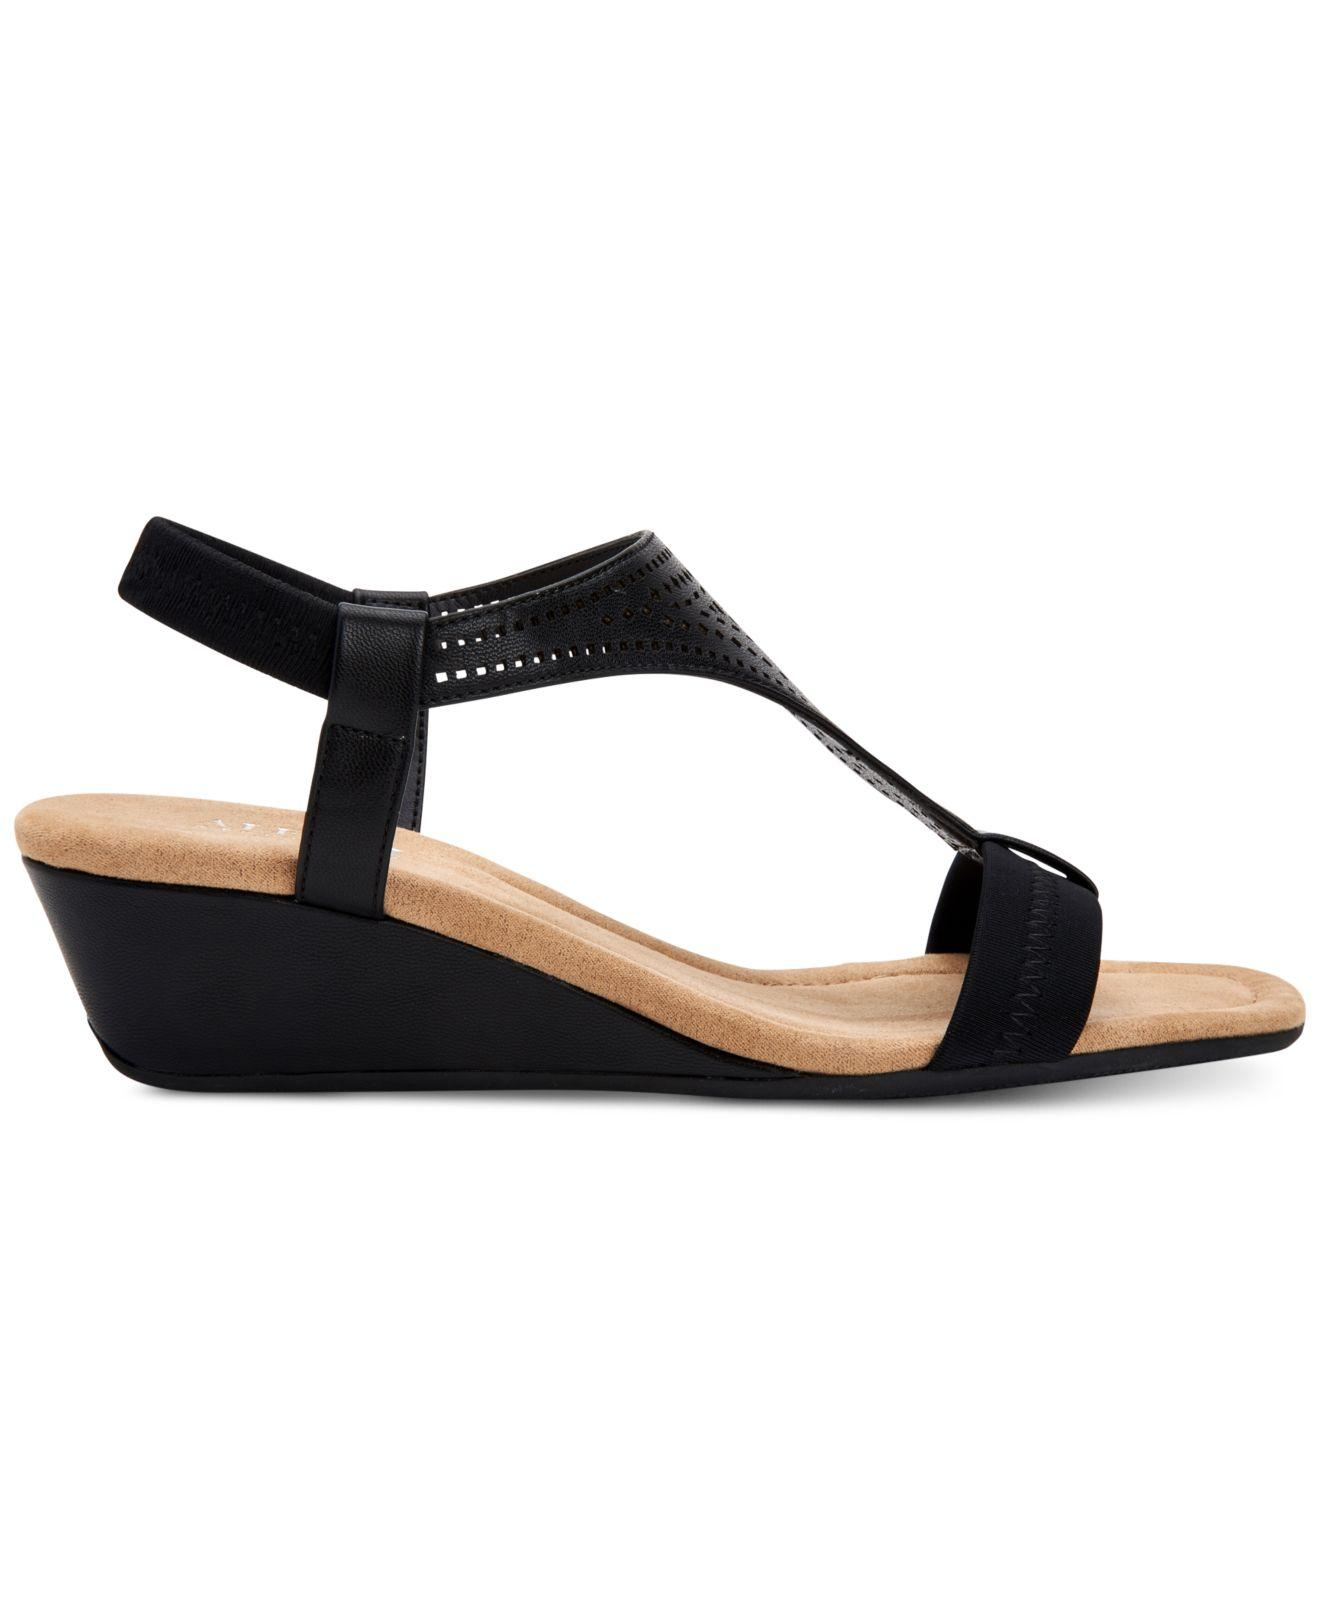 d83c87dc71da Lyst - Alfani Step  n Flex Vacanzaa Wedge Sandals